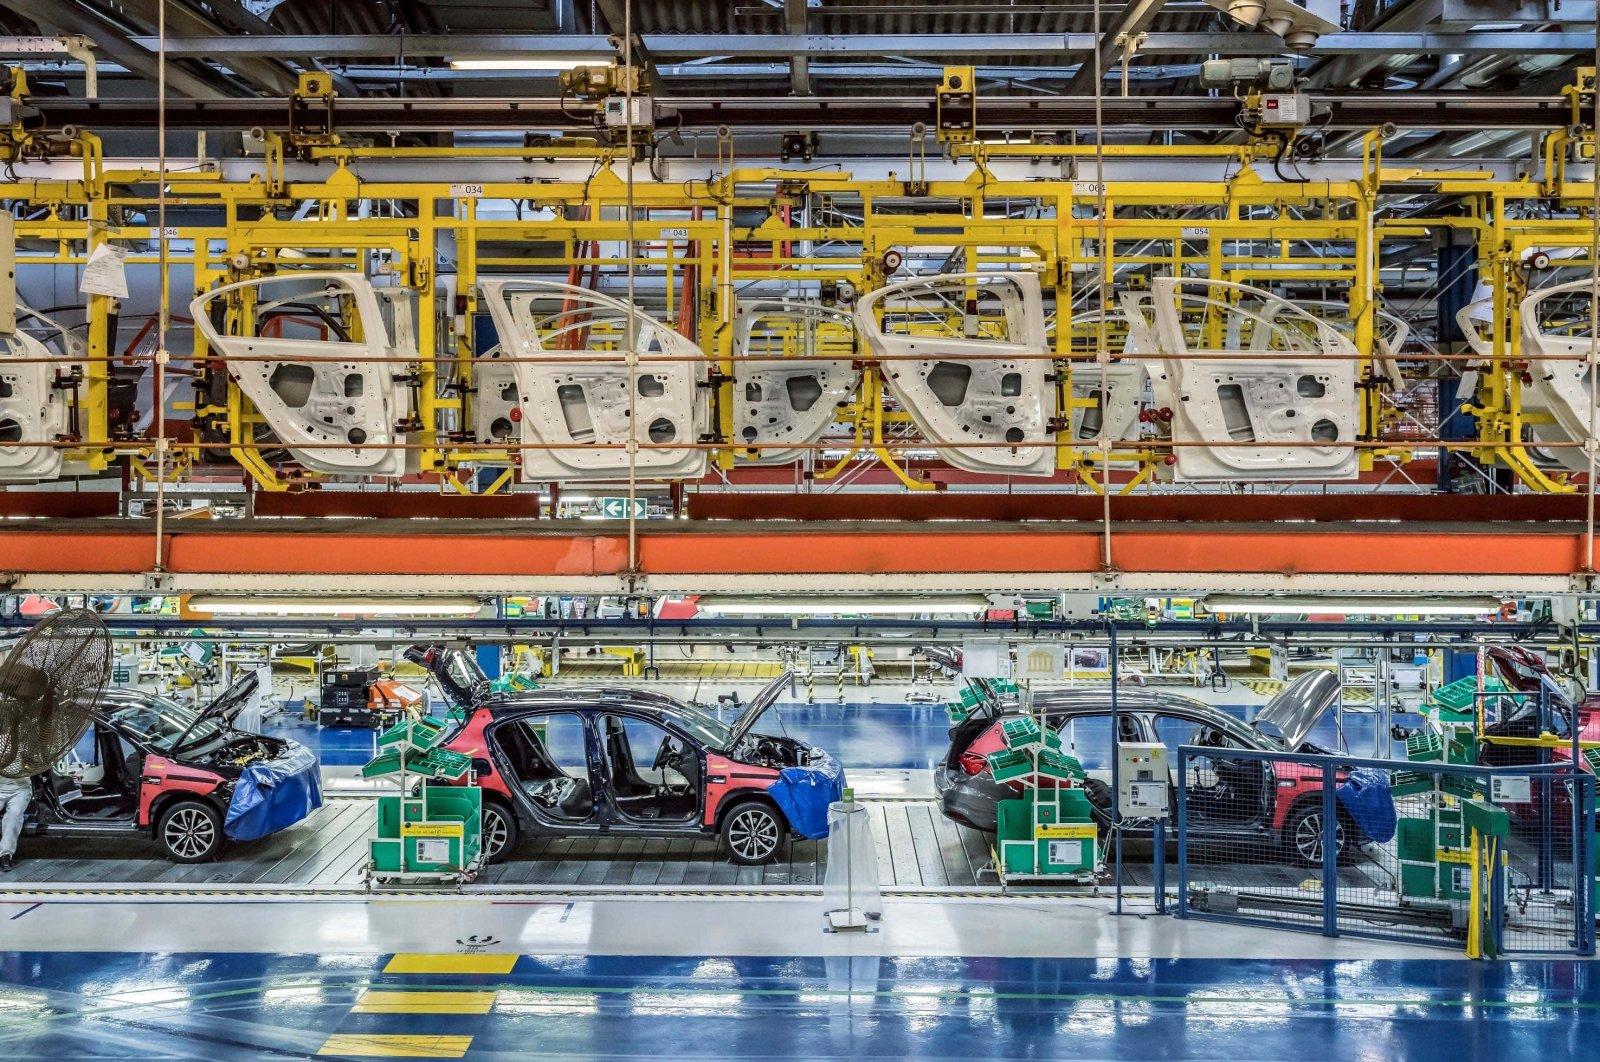 A joint venture of Turkey's Koç Holding and Italy's Fiat Chrysler, Tofaş's factory in northwestern Turkey's Bursa province. (AA Photo)